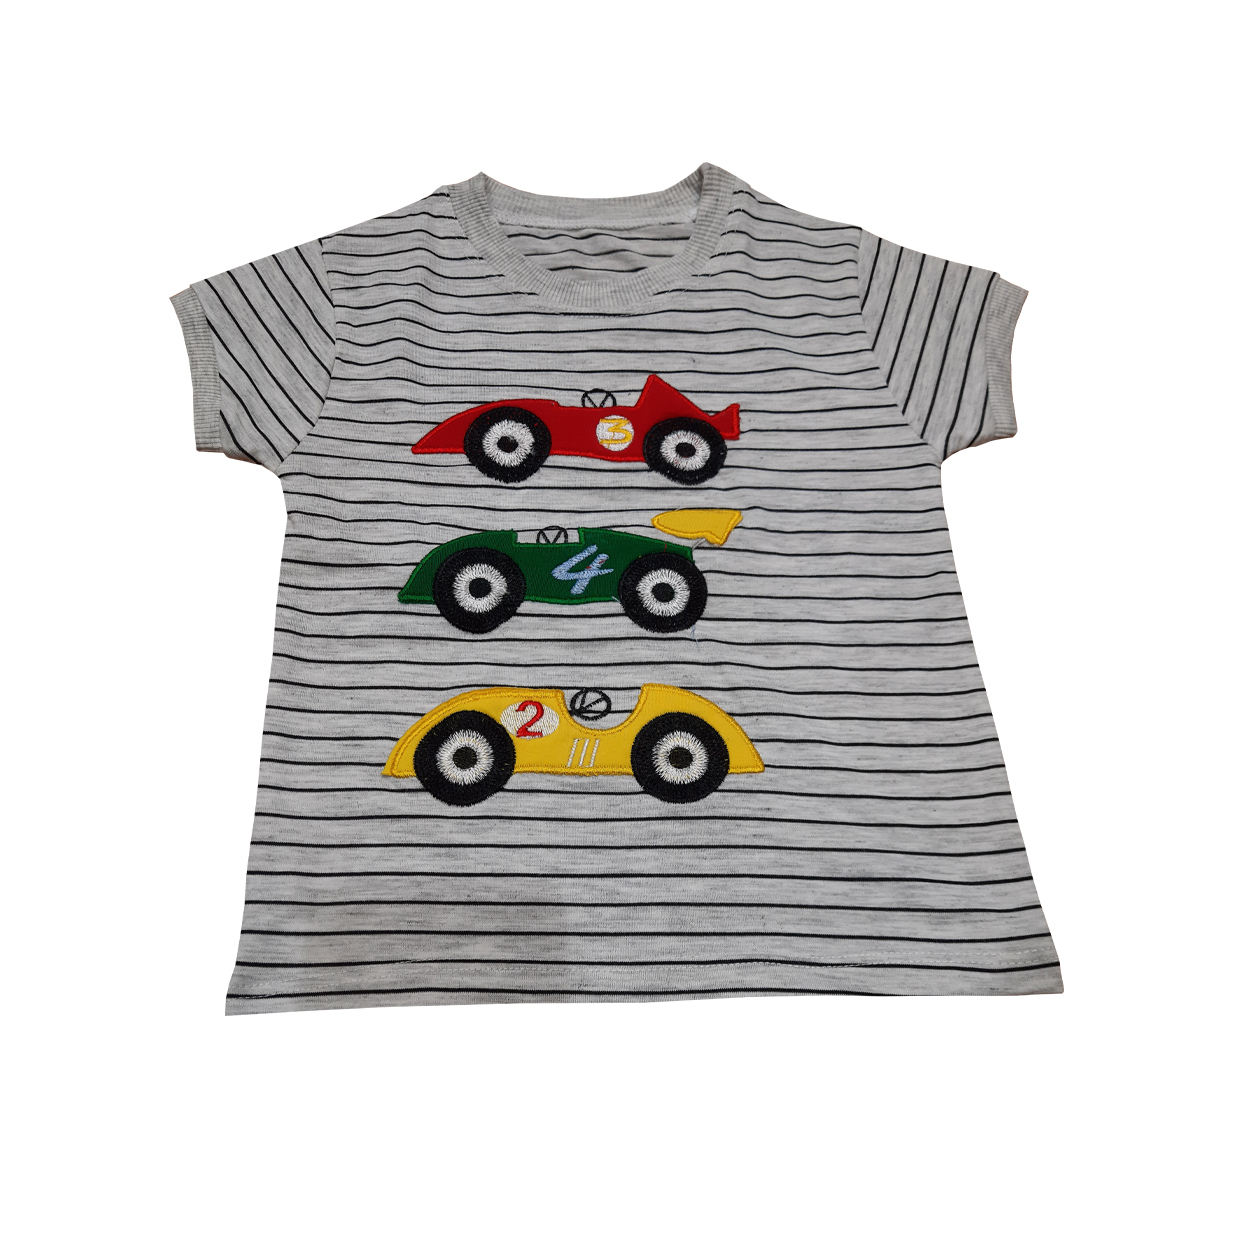 تی شرت پسرانه کد 1212 -  - 3